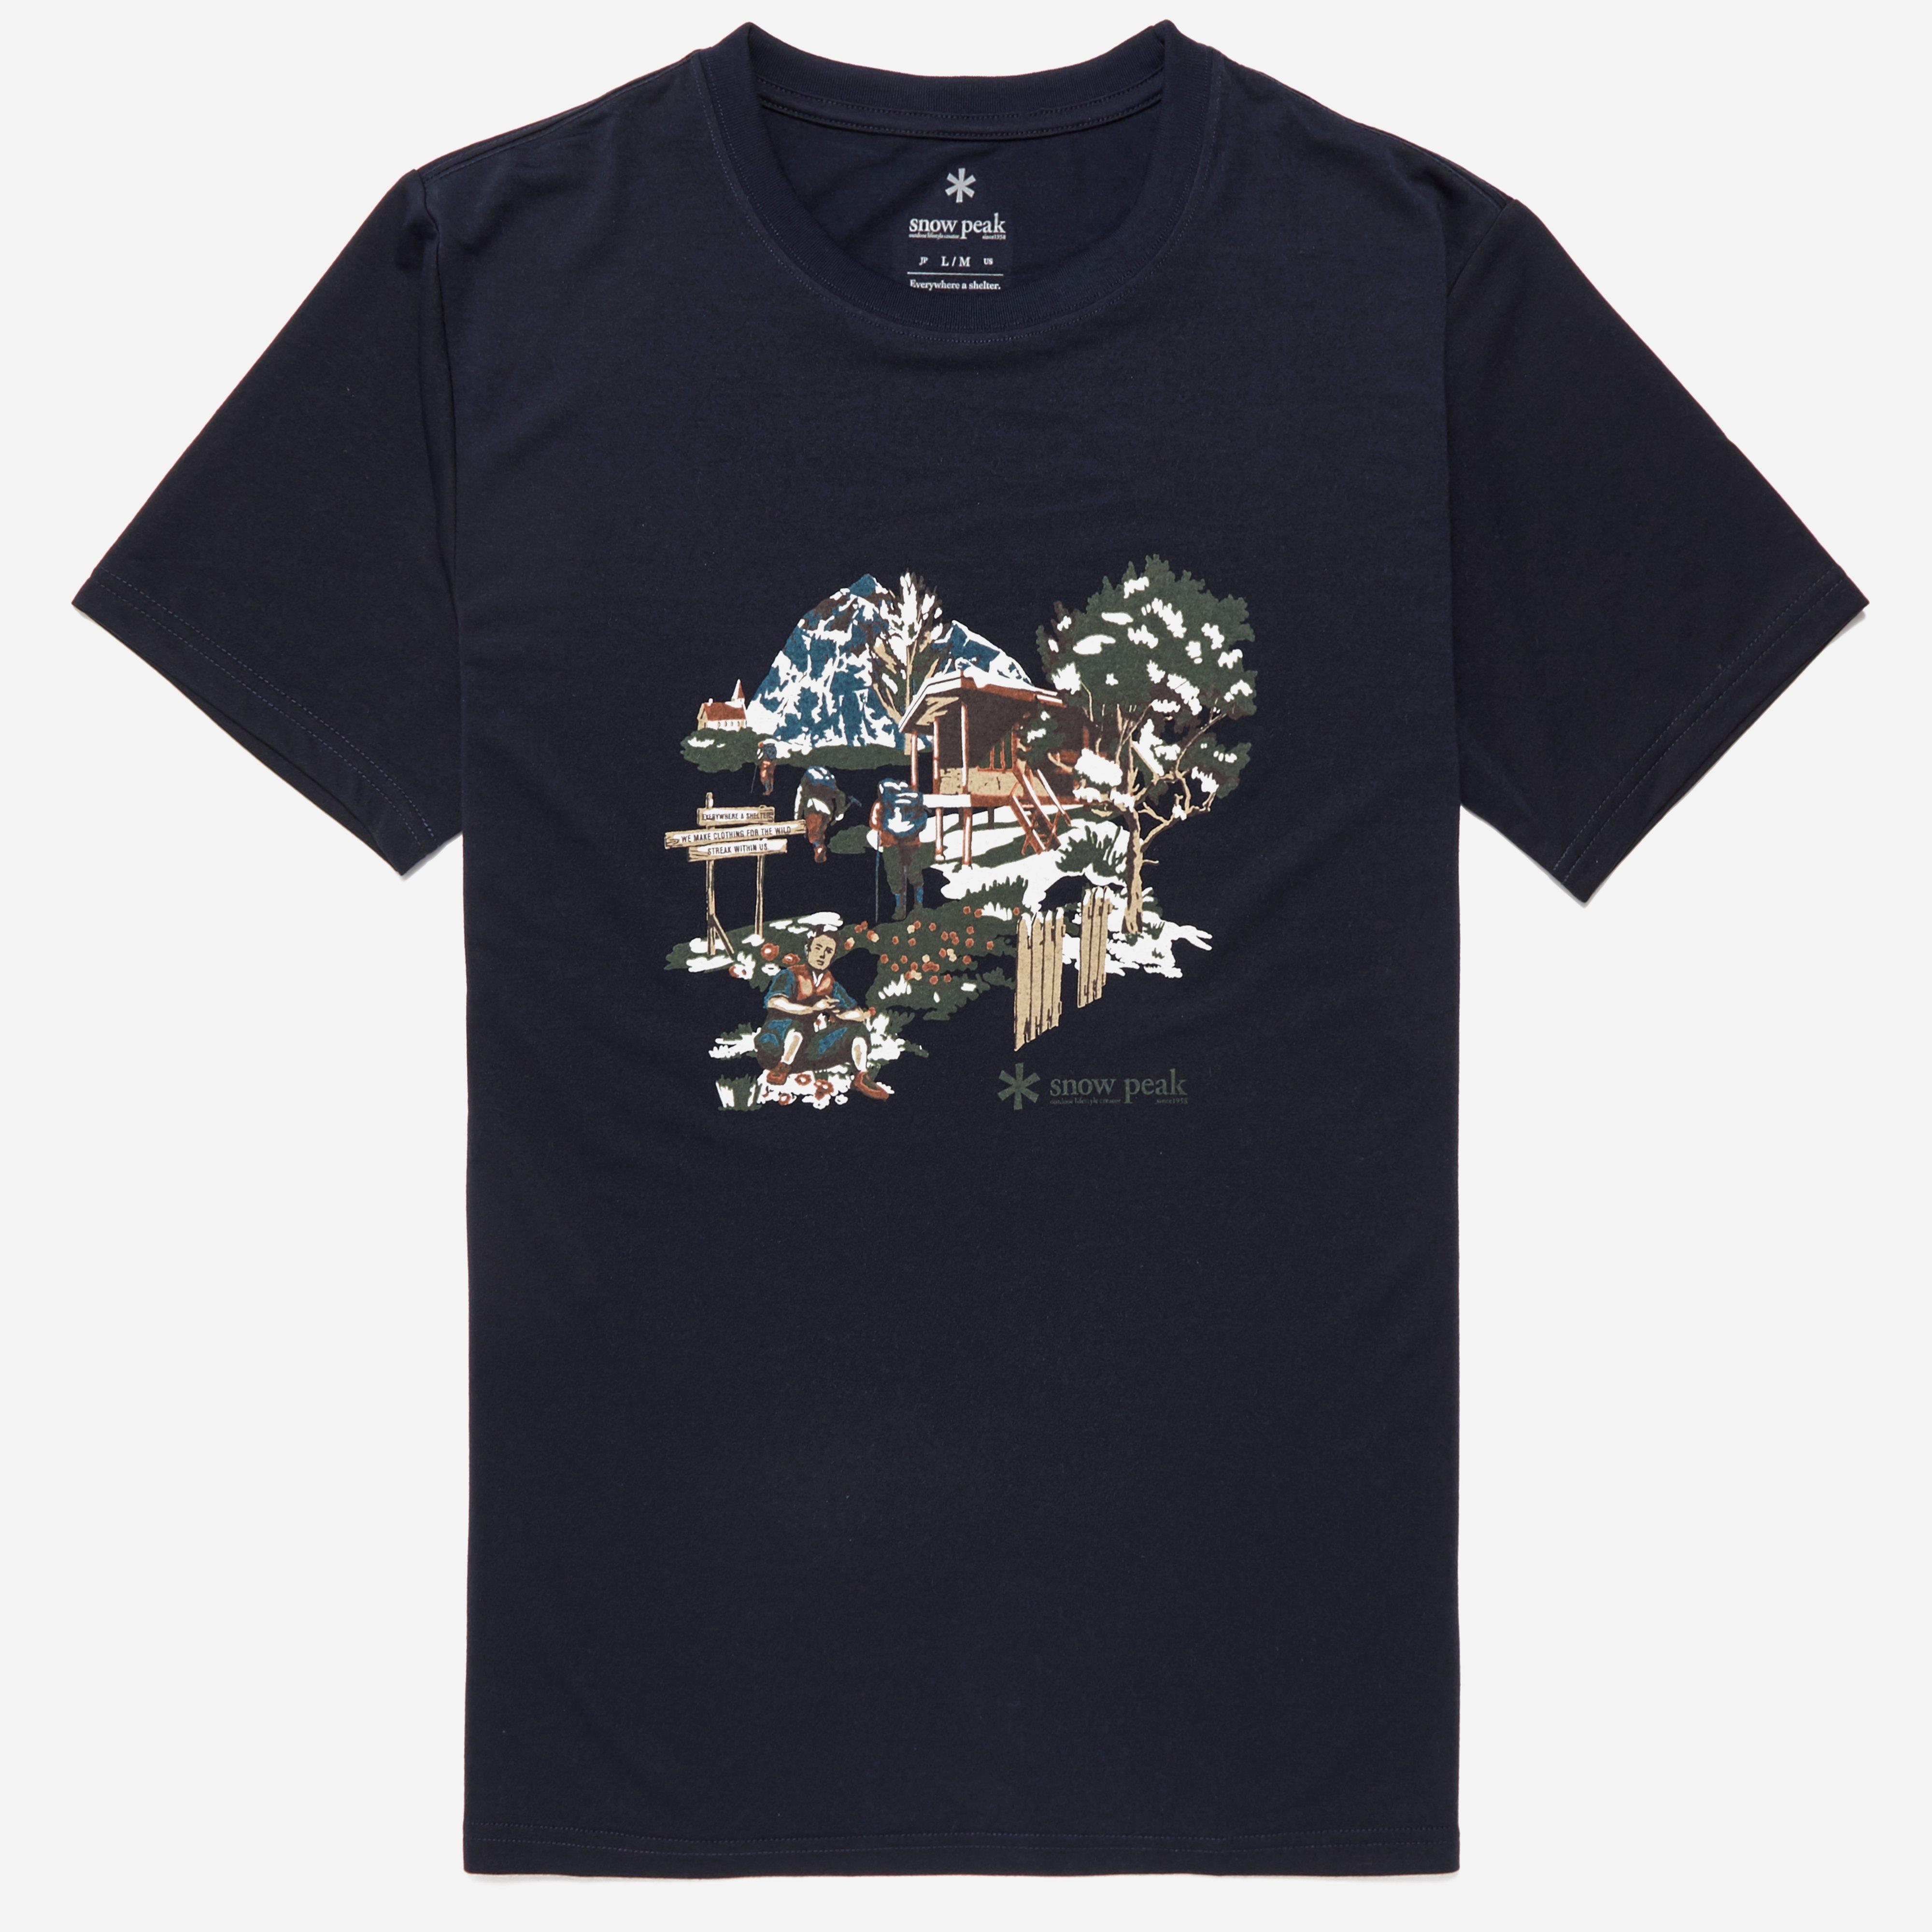 Snow Peak Campfield T-shirt